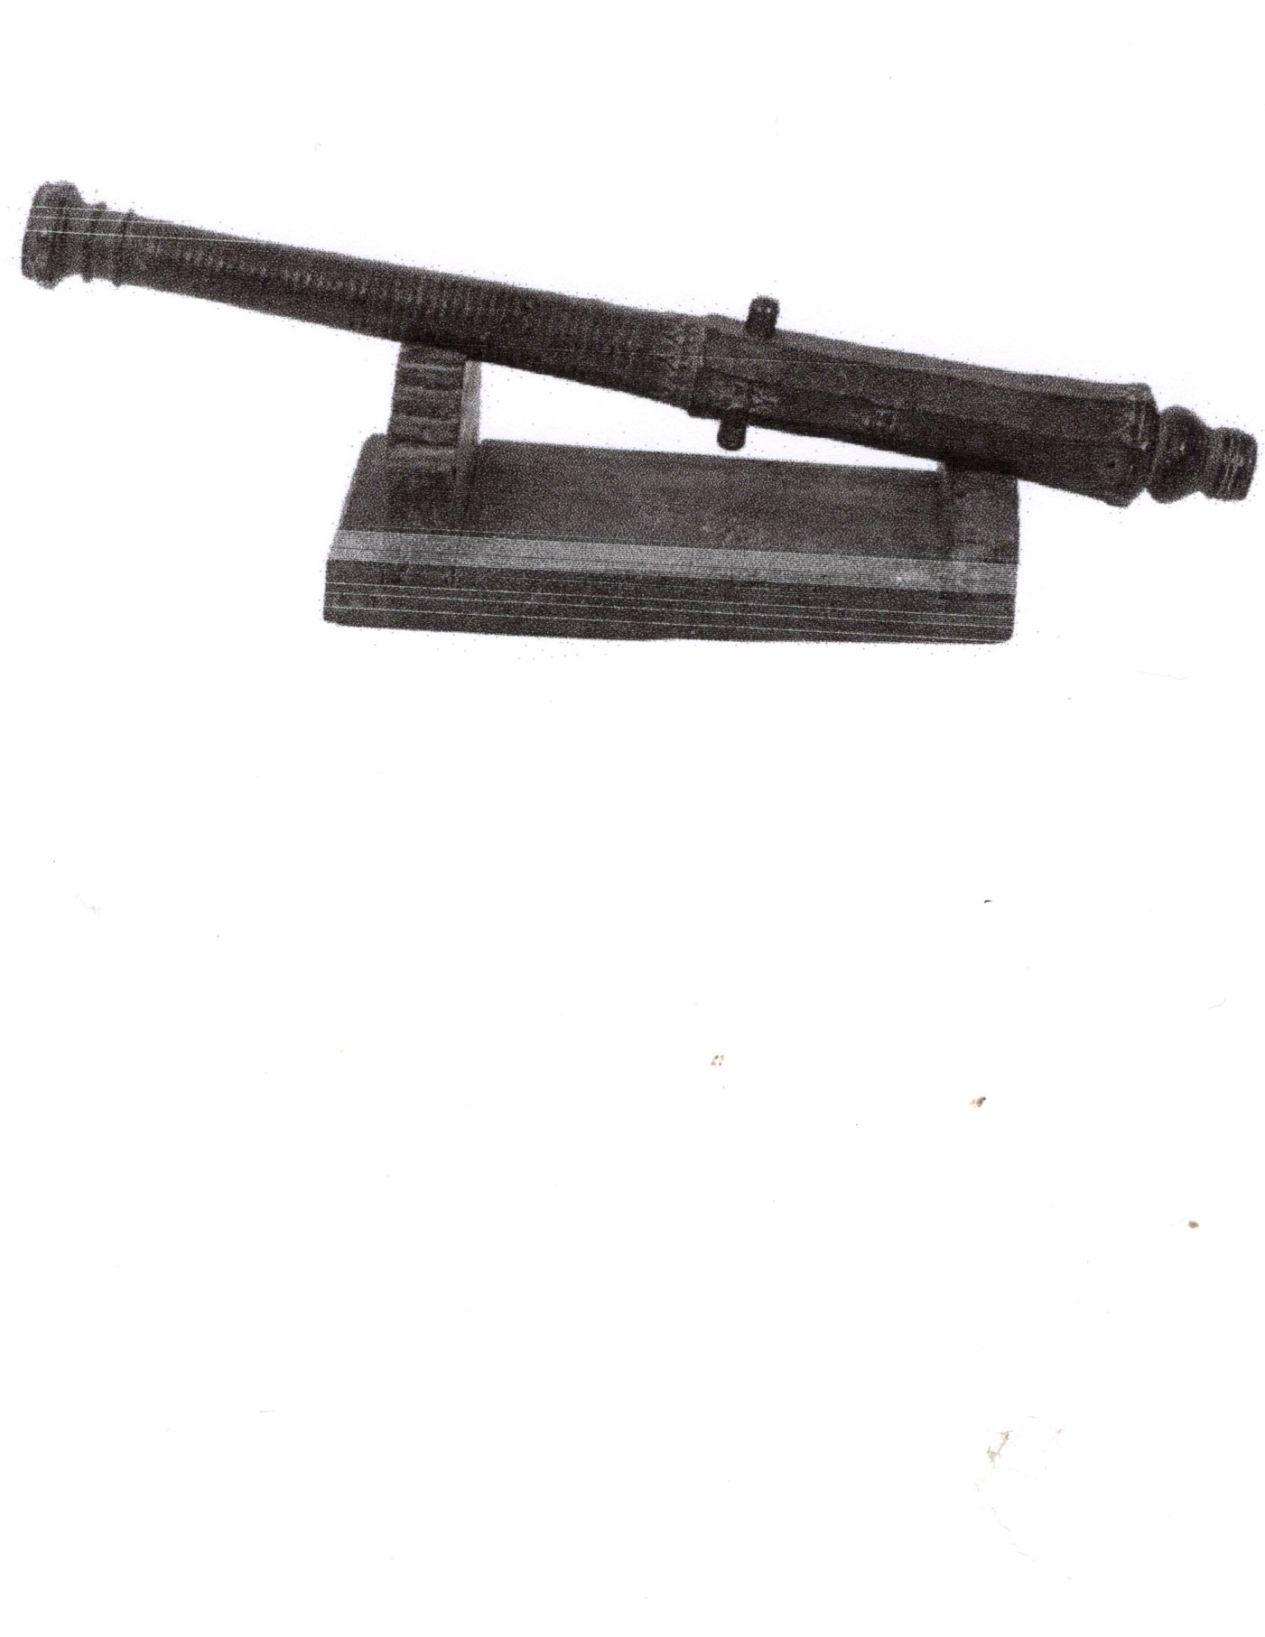 Swivel cannon